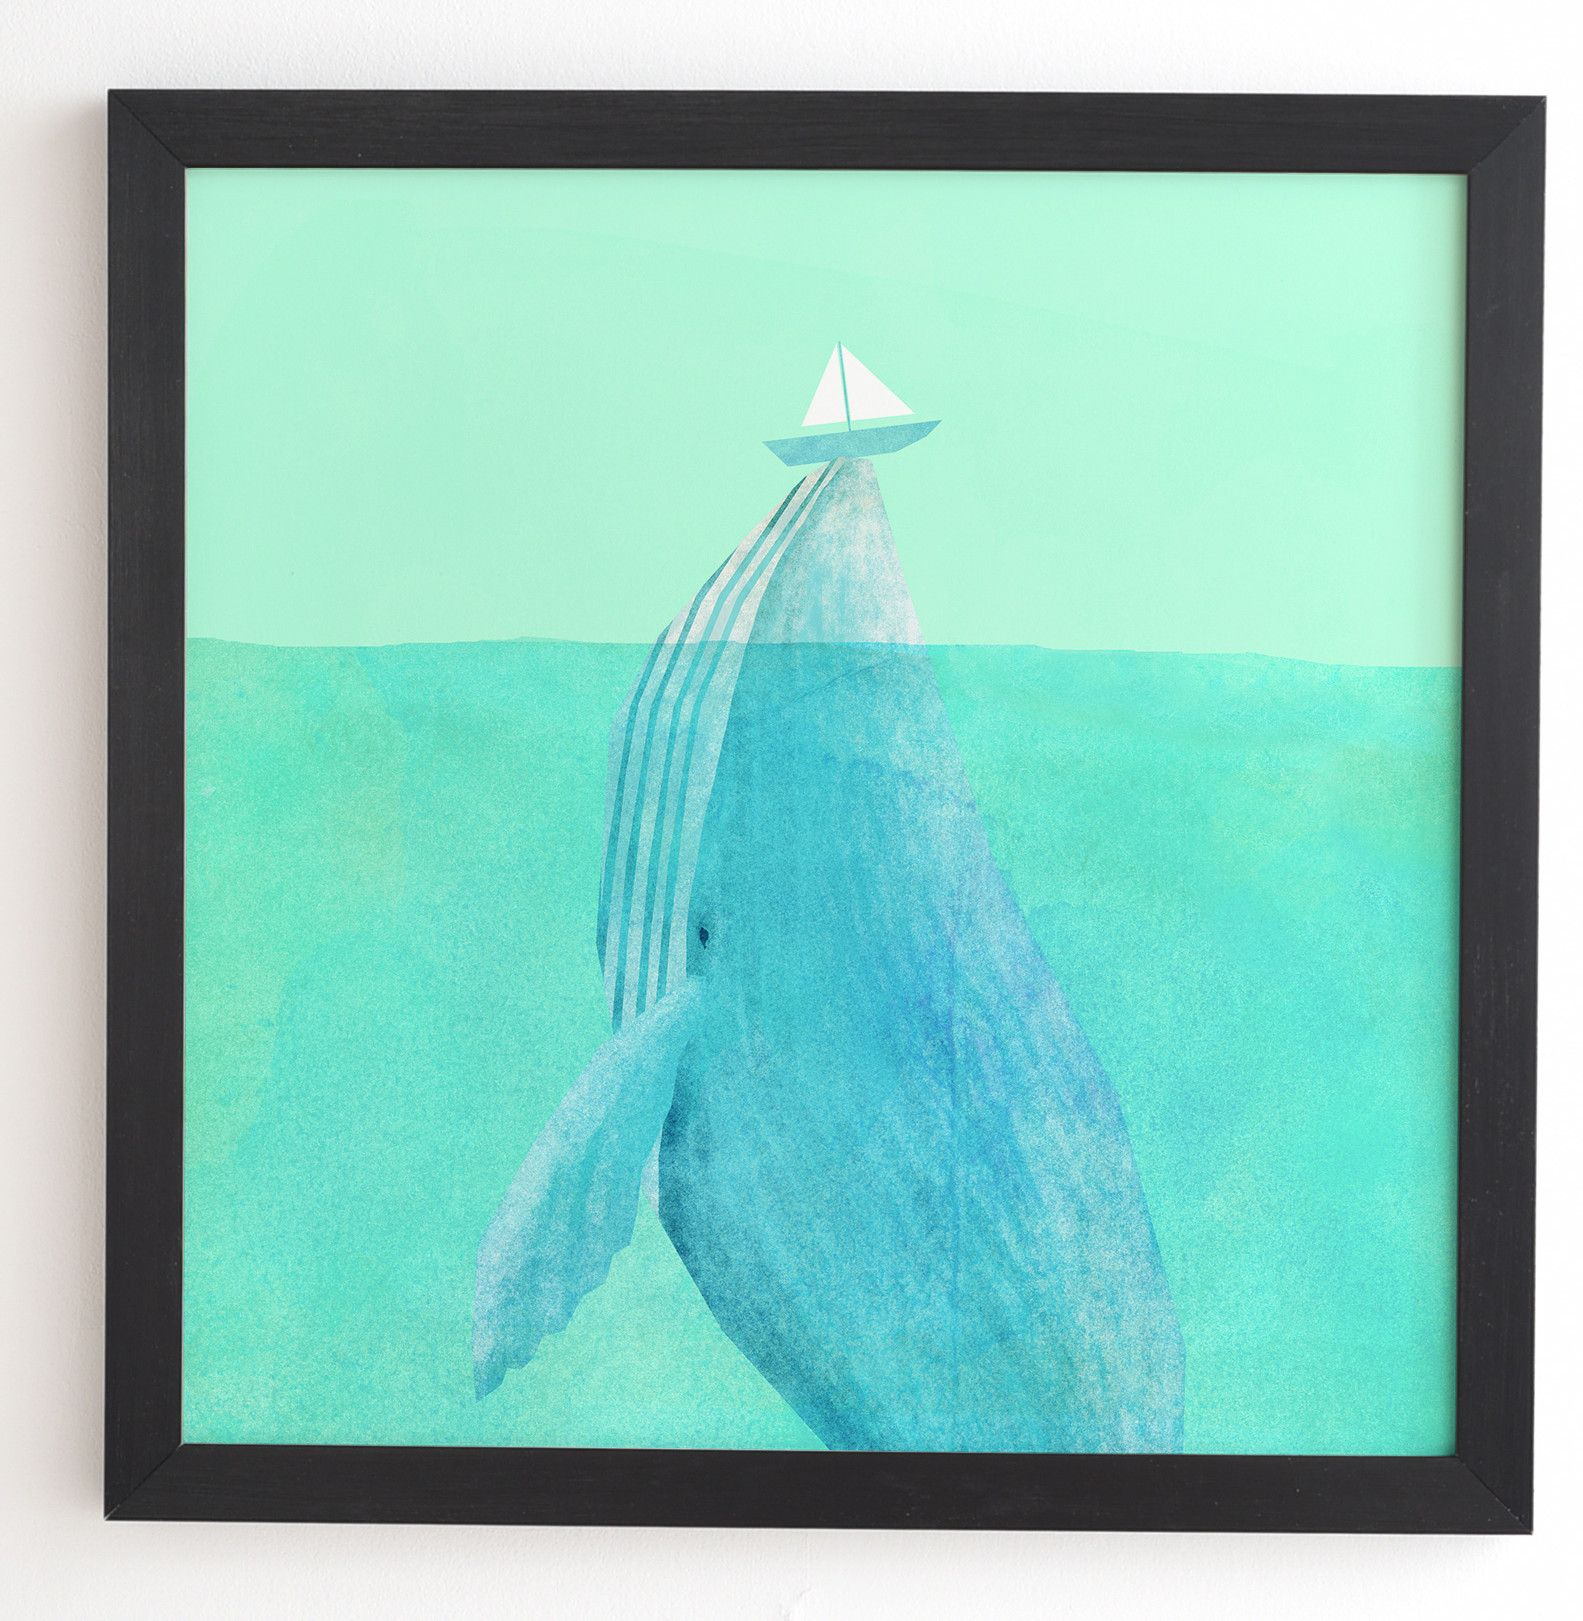 Lift Framed Painting Print